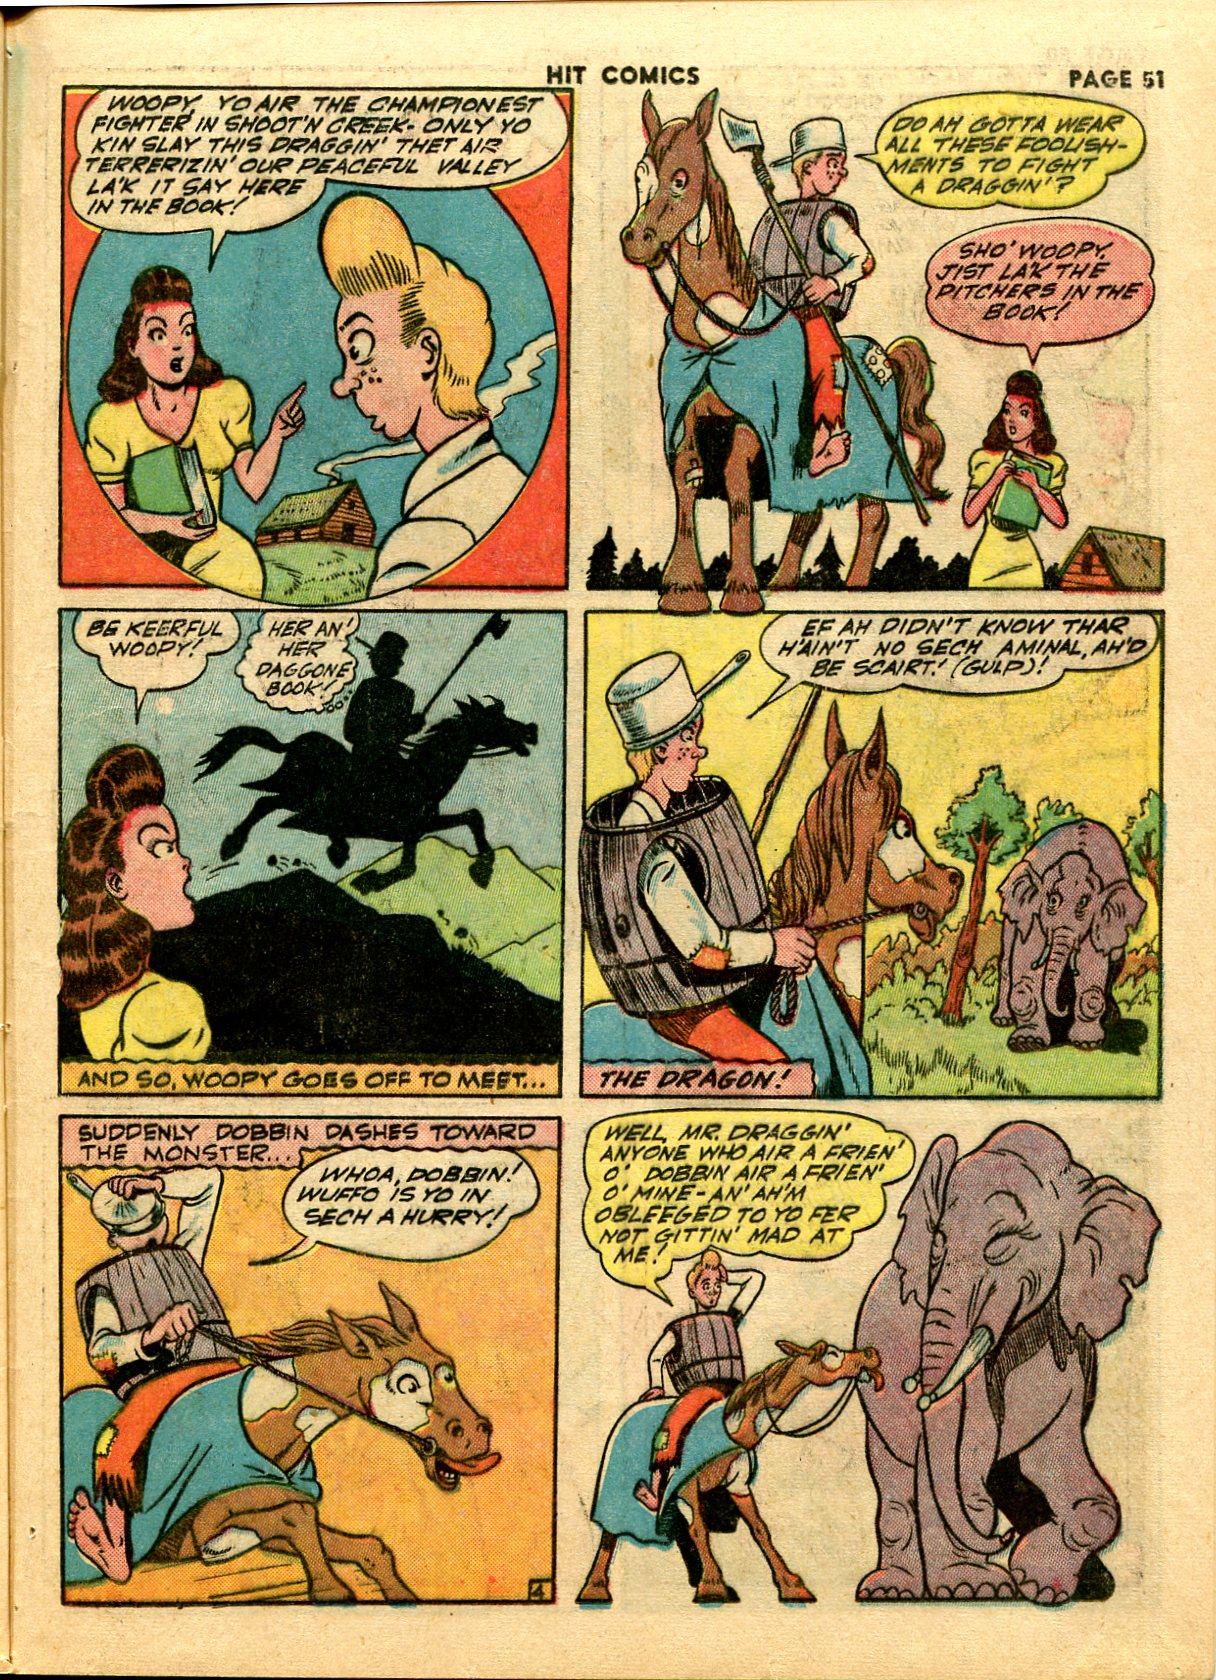 Read online Hit Comics comic -  Issue #28 - 54